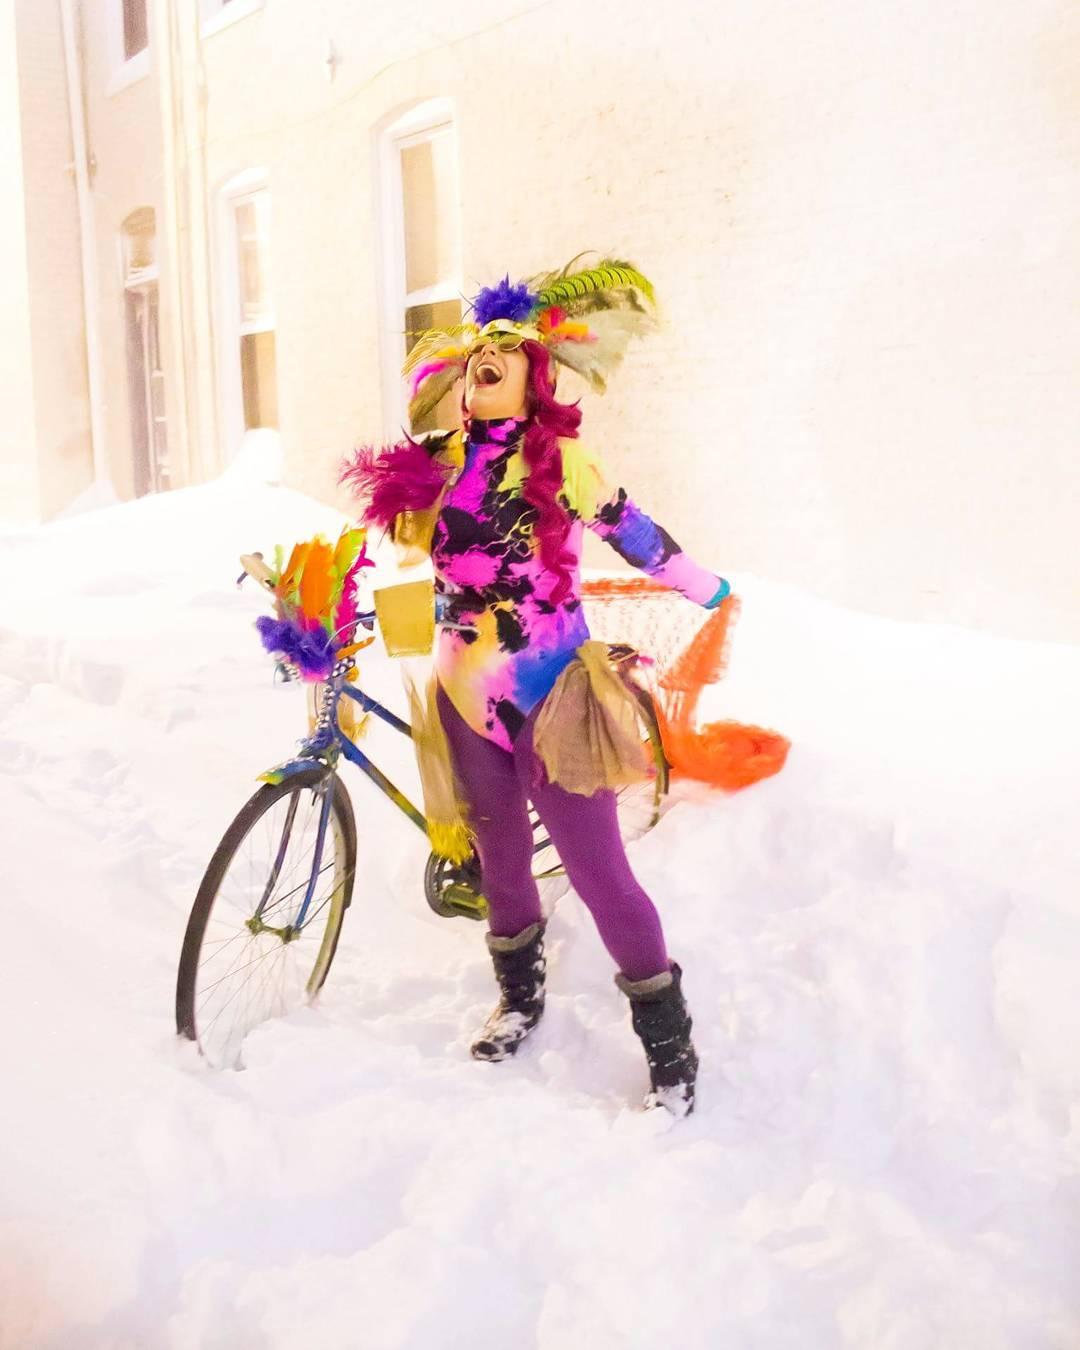 Art Bike Photo Shoot 2016